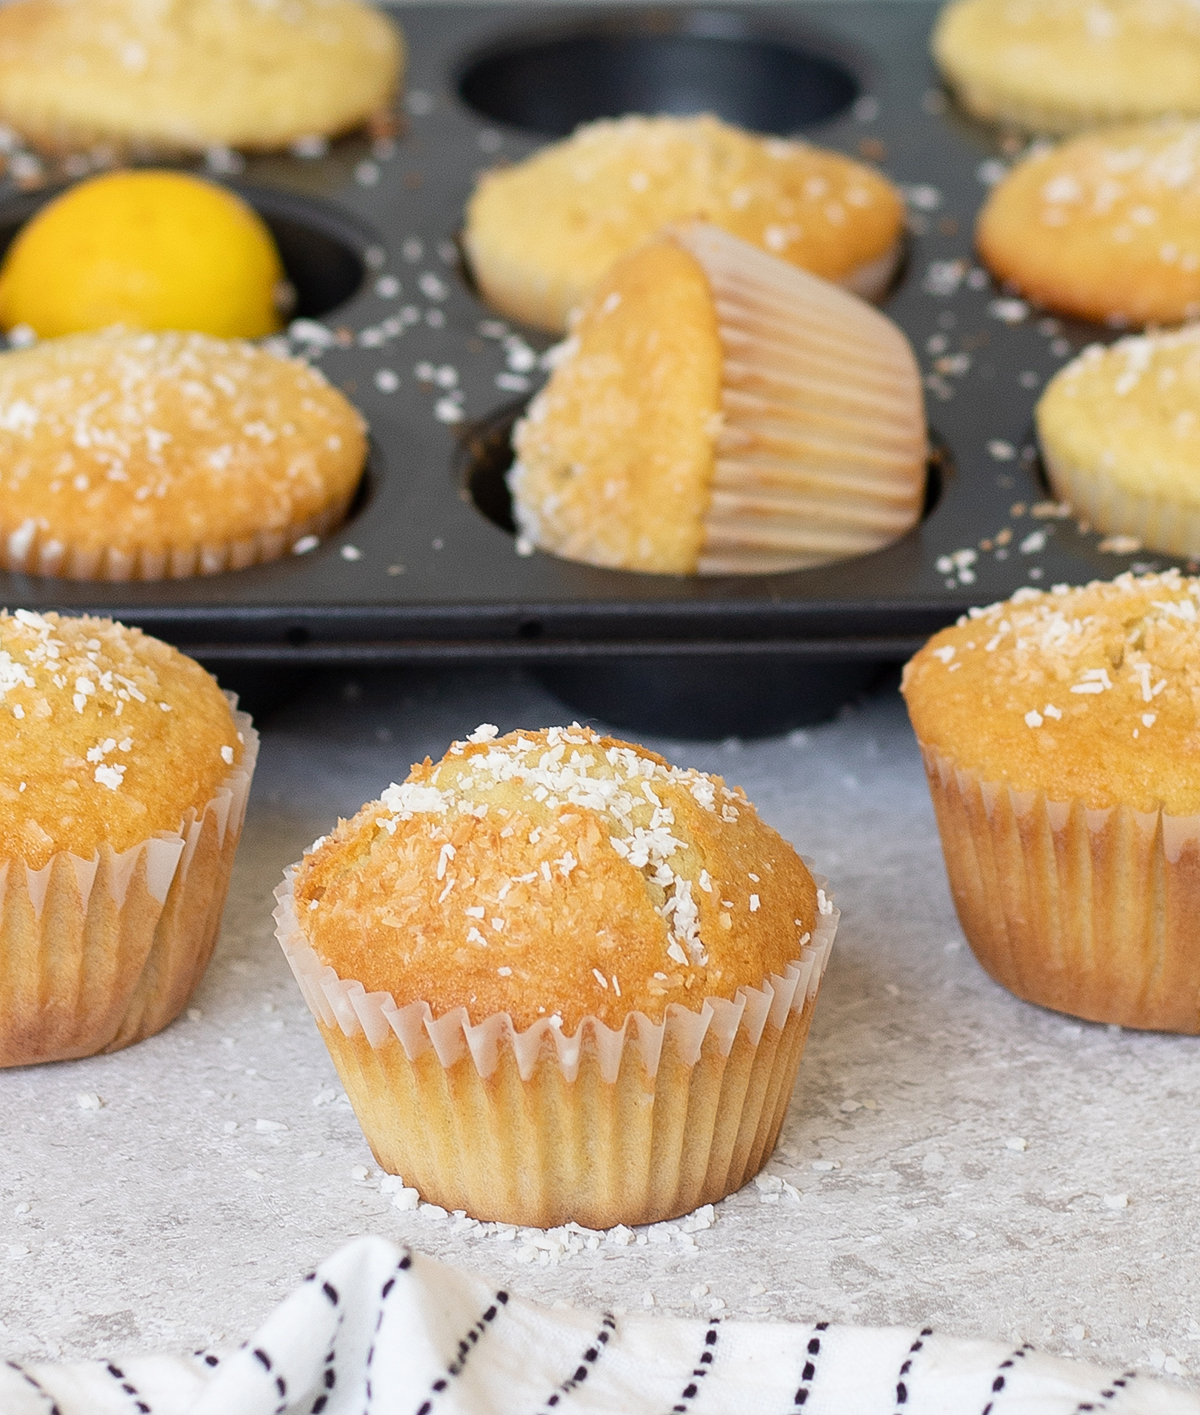 lots of Lemon Coconut Muffins